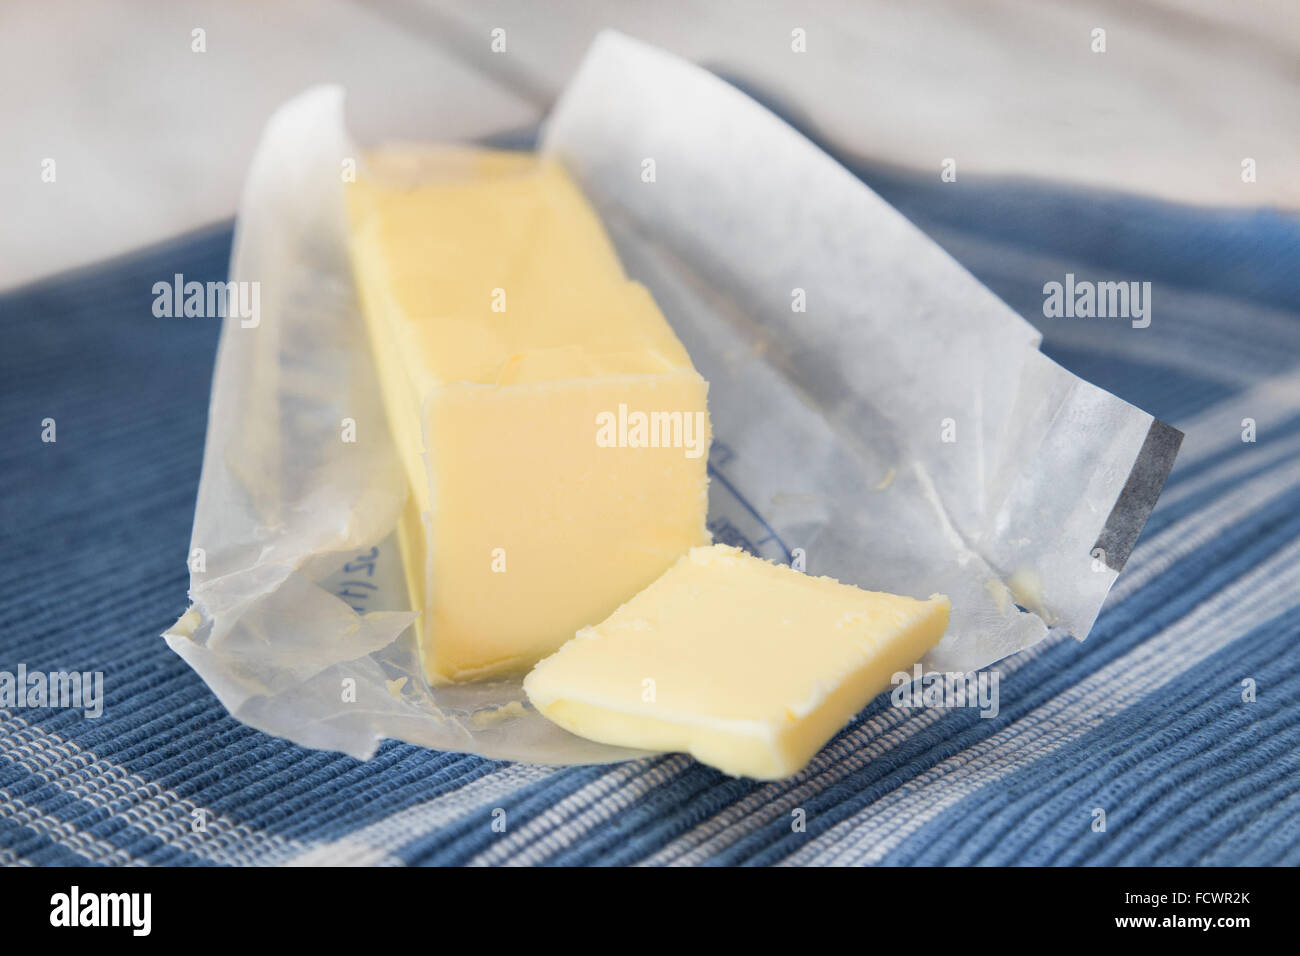 Stick de mantequilla fresca creamery en contenedor abierto Imagen De Stock